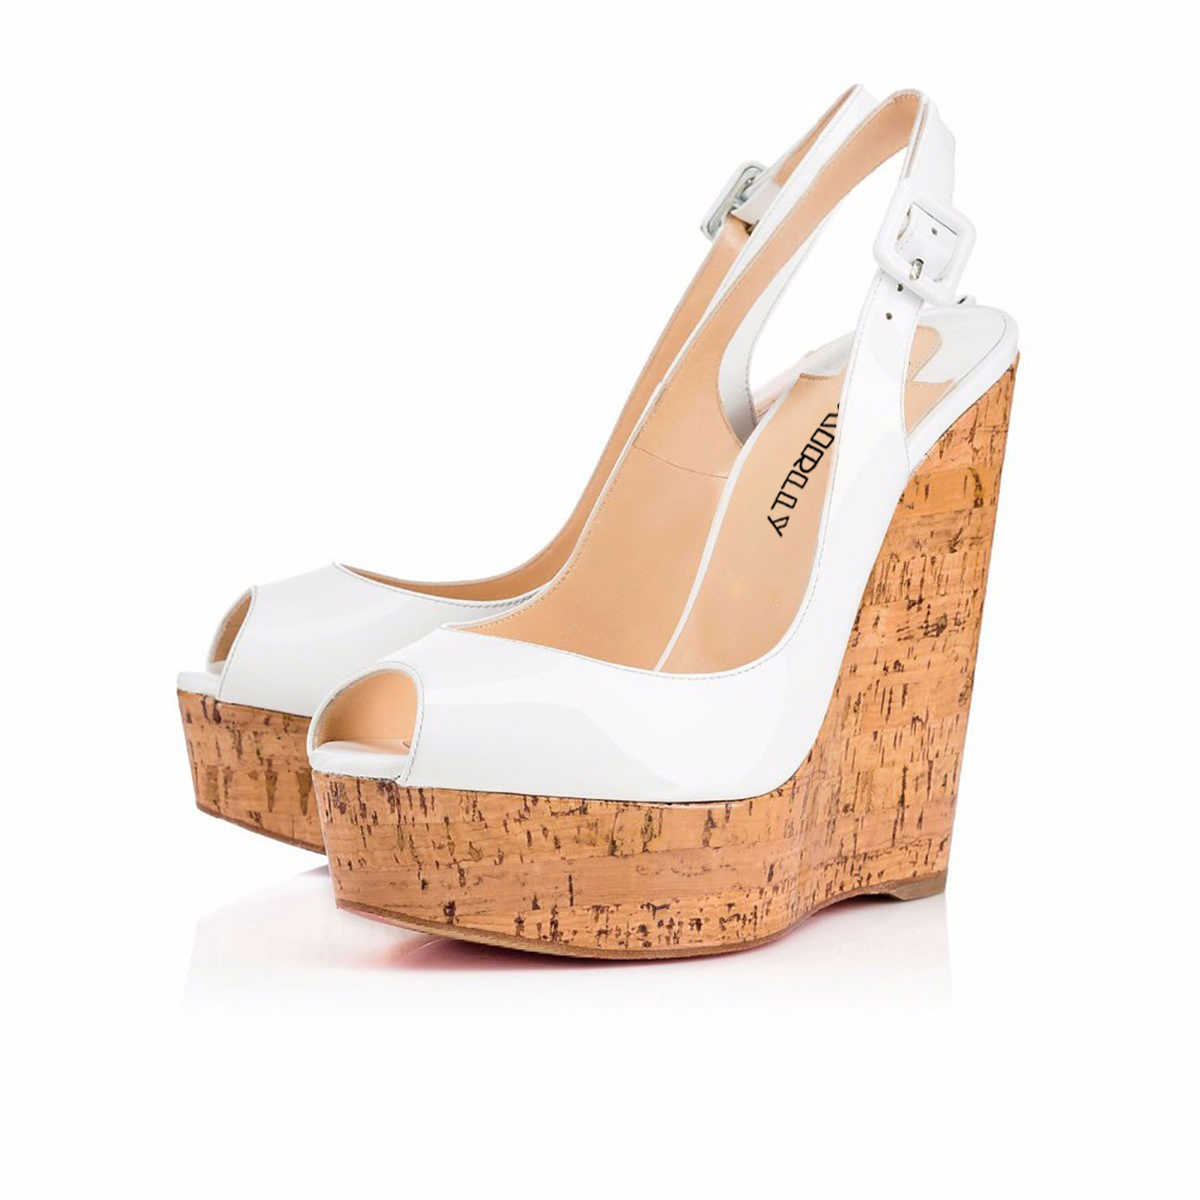 81ab95838 ... Lisse Women Cork Wedge Sky High Platform High Heel Sandals Slingback  Pumps Summer Shoes Comfortable to ...